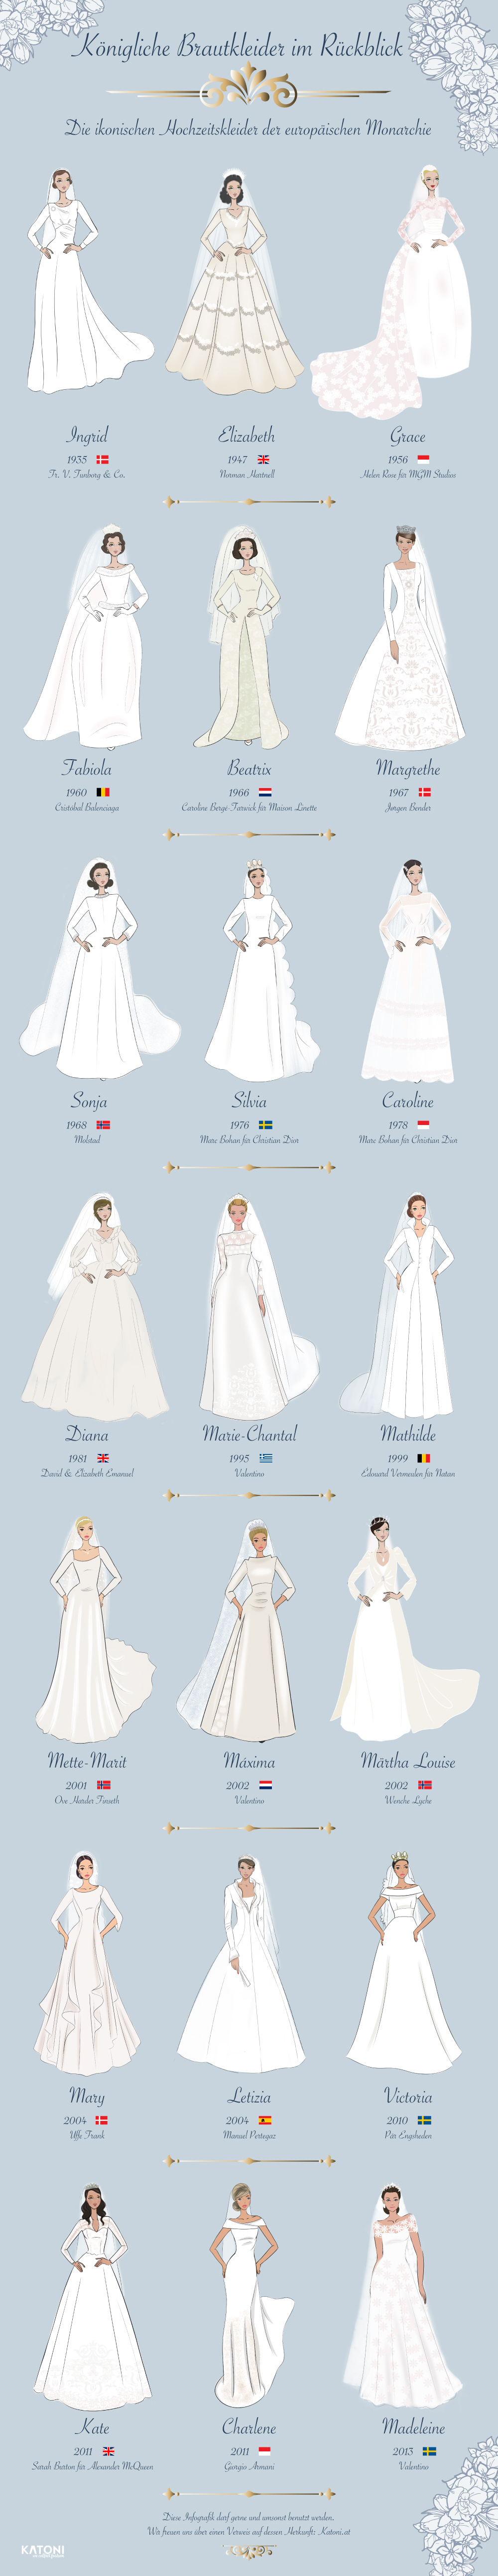 Royale brudekjoler gennem tiden